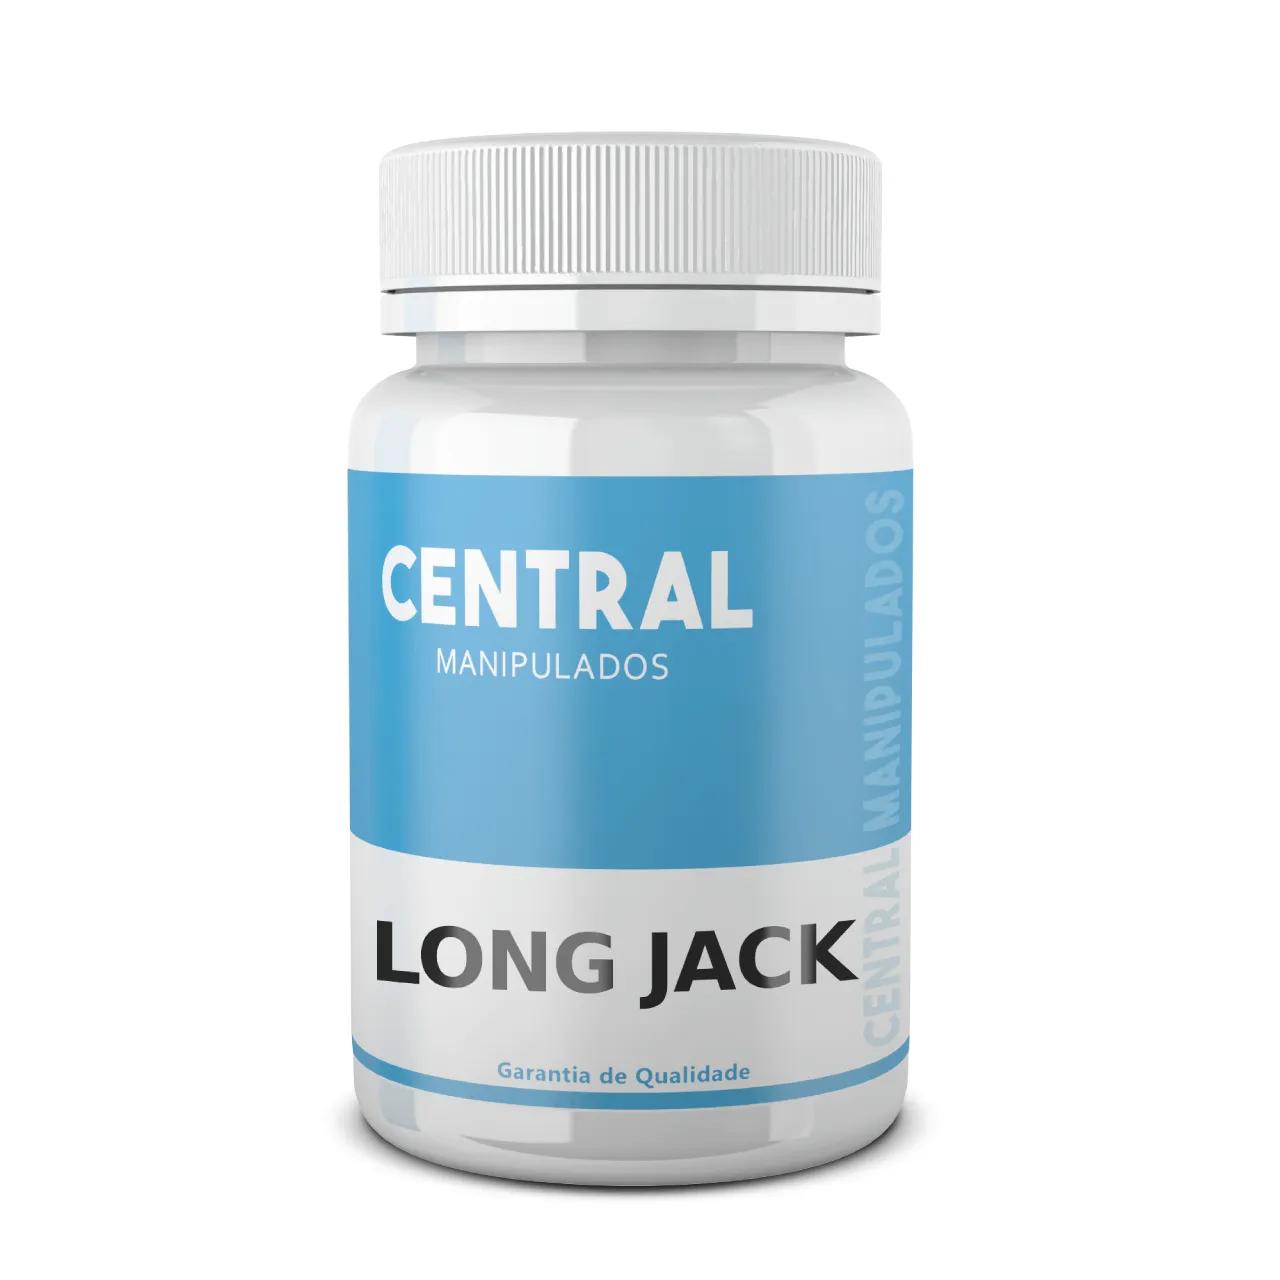 Long Jack 400mg - 60 cápsulas - Performance, Aumento da Testosterona